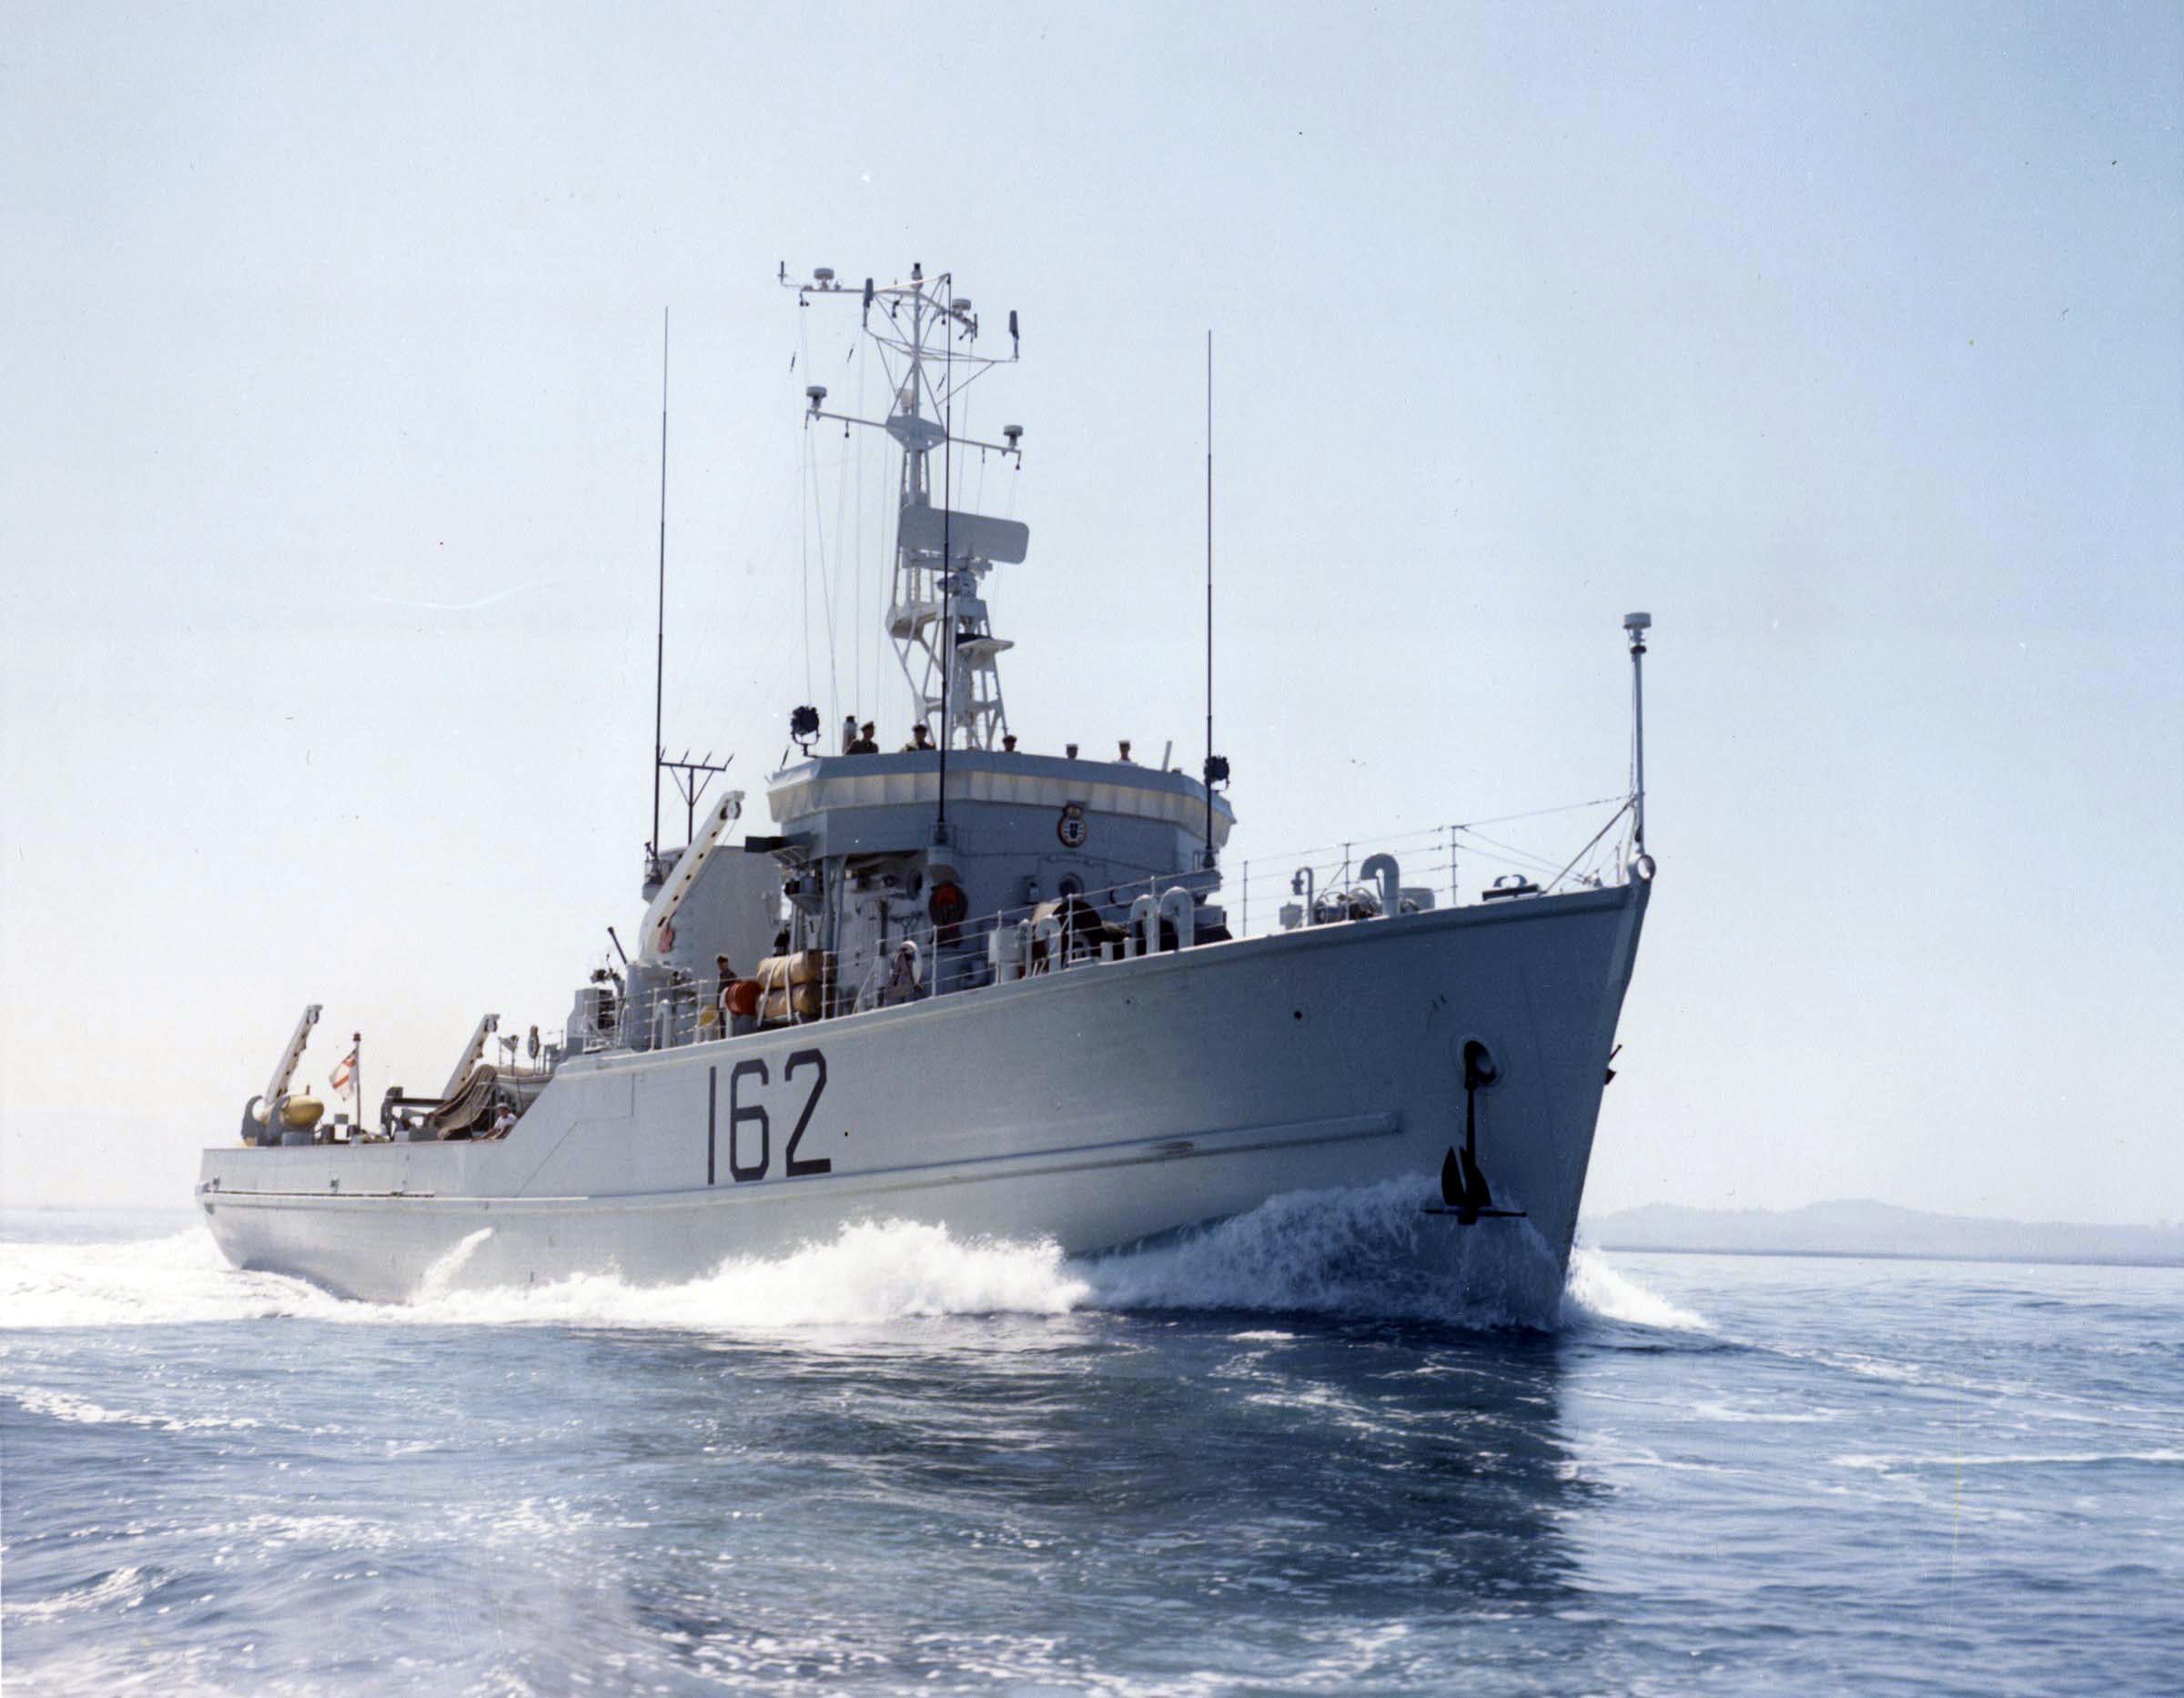 HMCS COWICHAN (3rd)